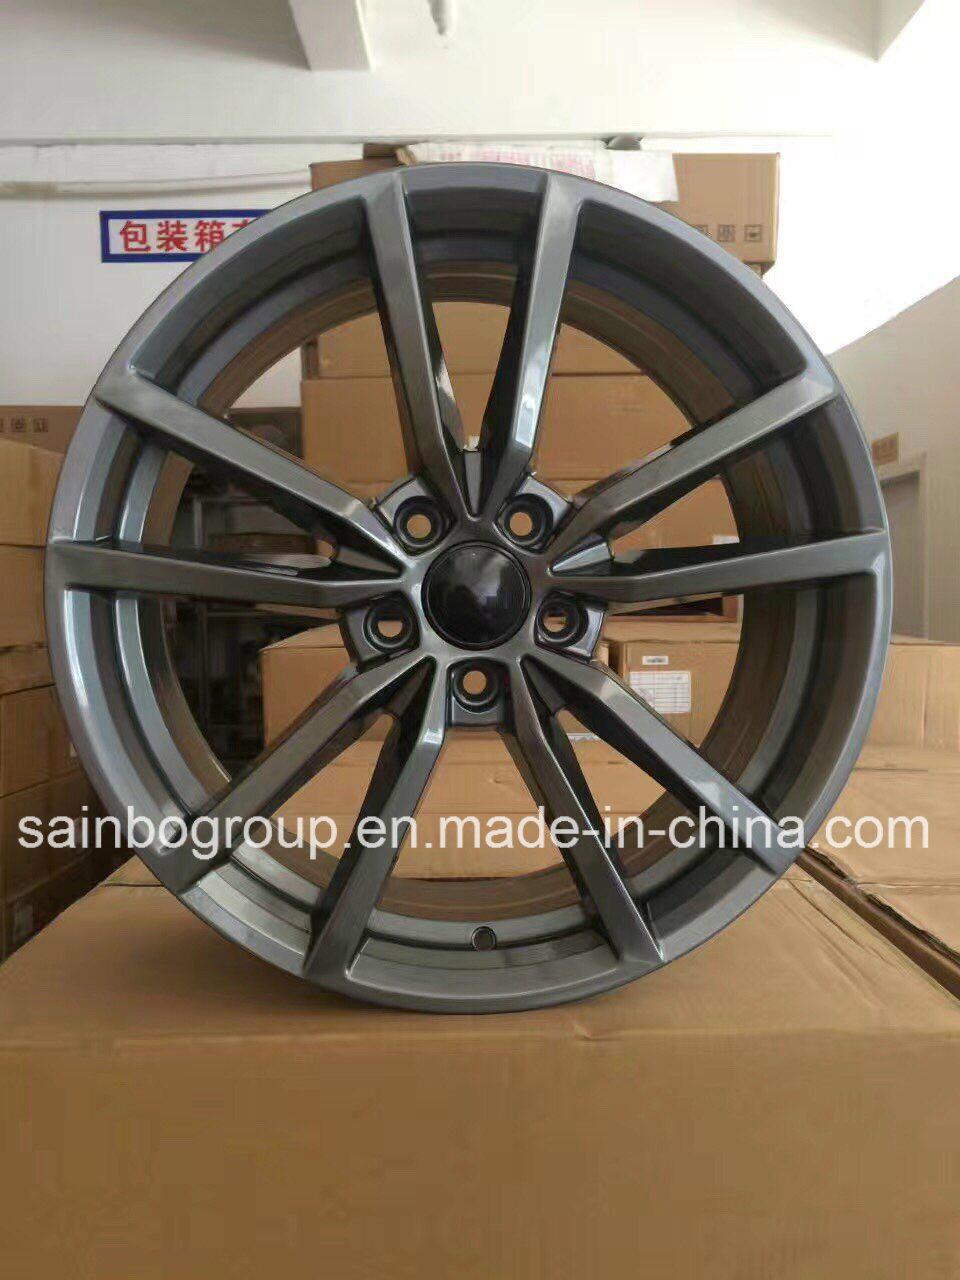 China 17 18 19inch Replica Wheels Rims For 2015 Vw Golf R China 2015 Vw Golf R Wheels Vw Wheels